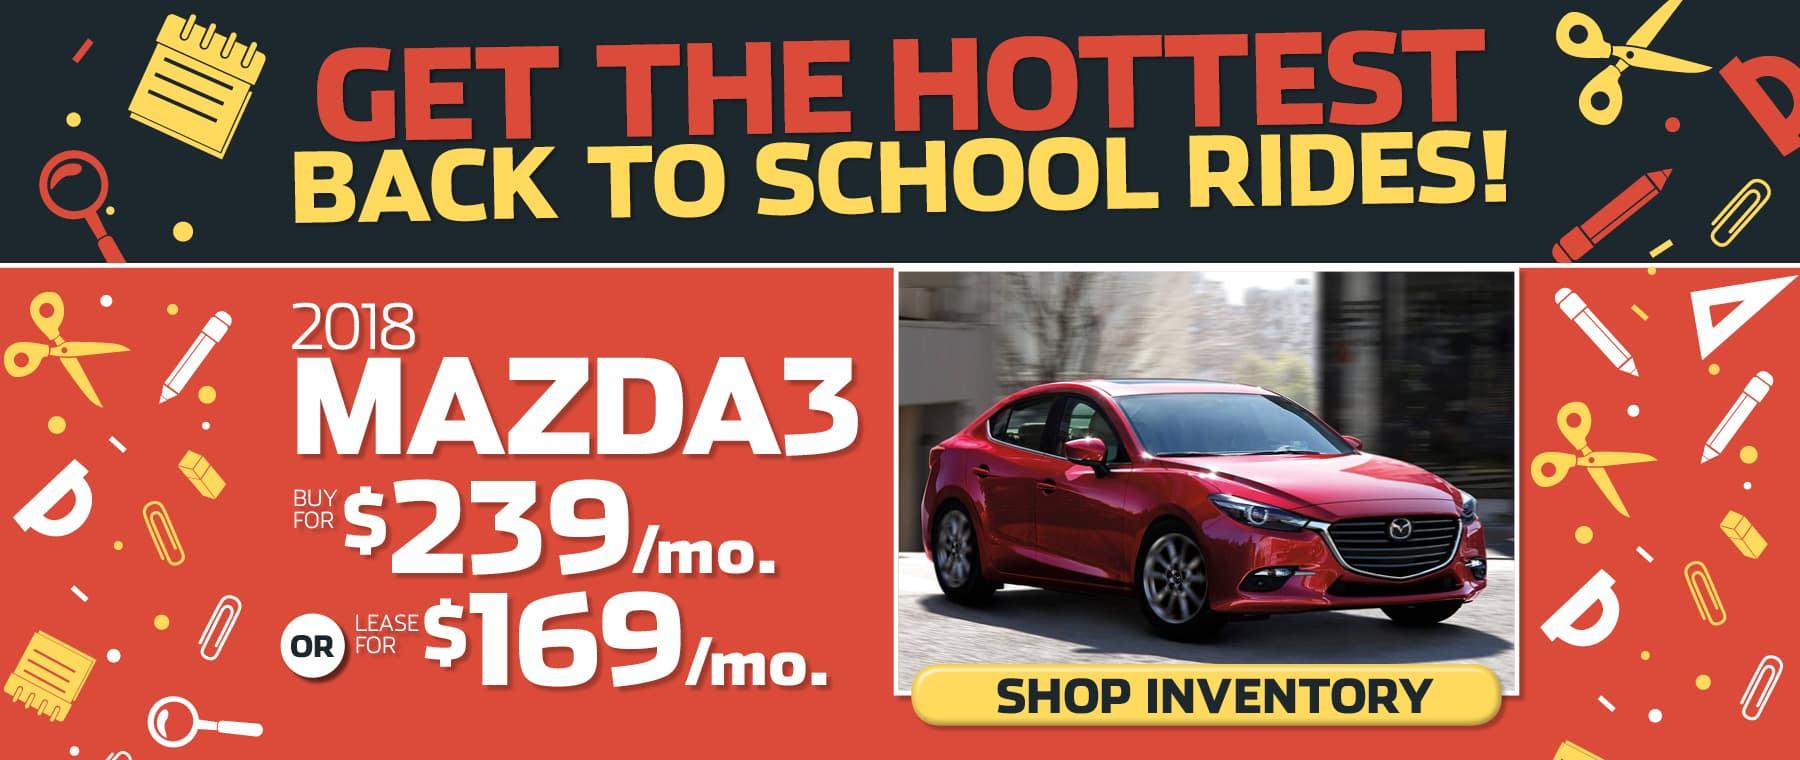 Mazda3 Banner 2018